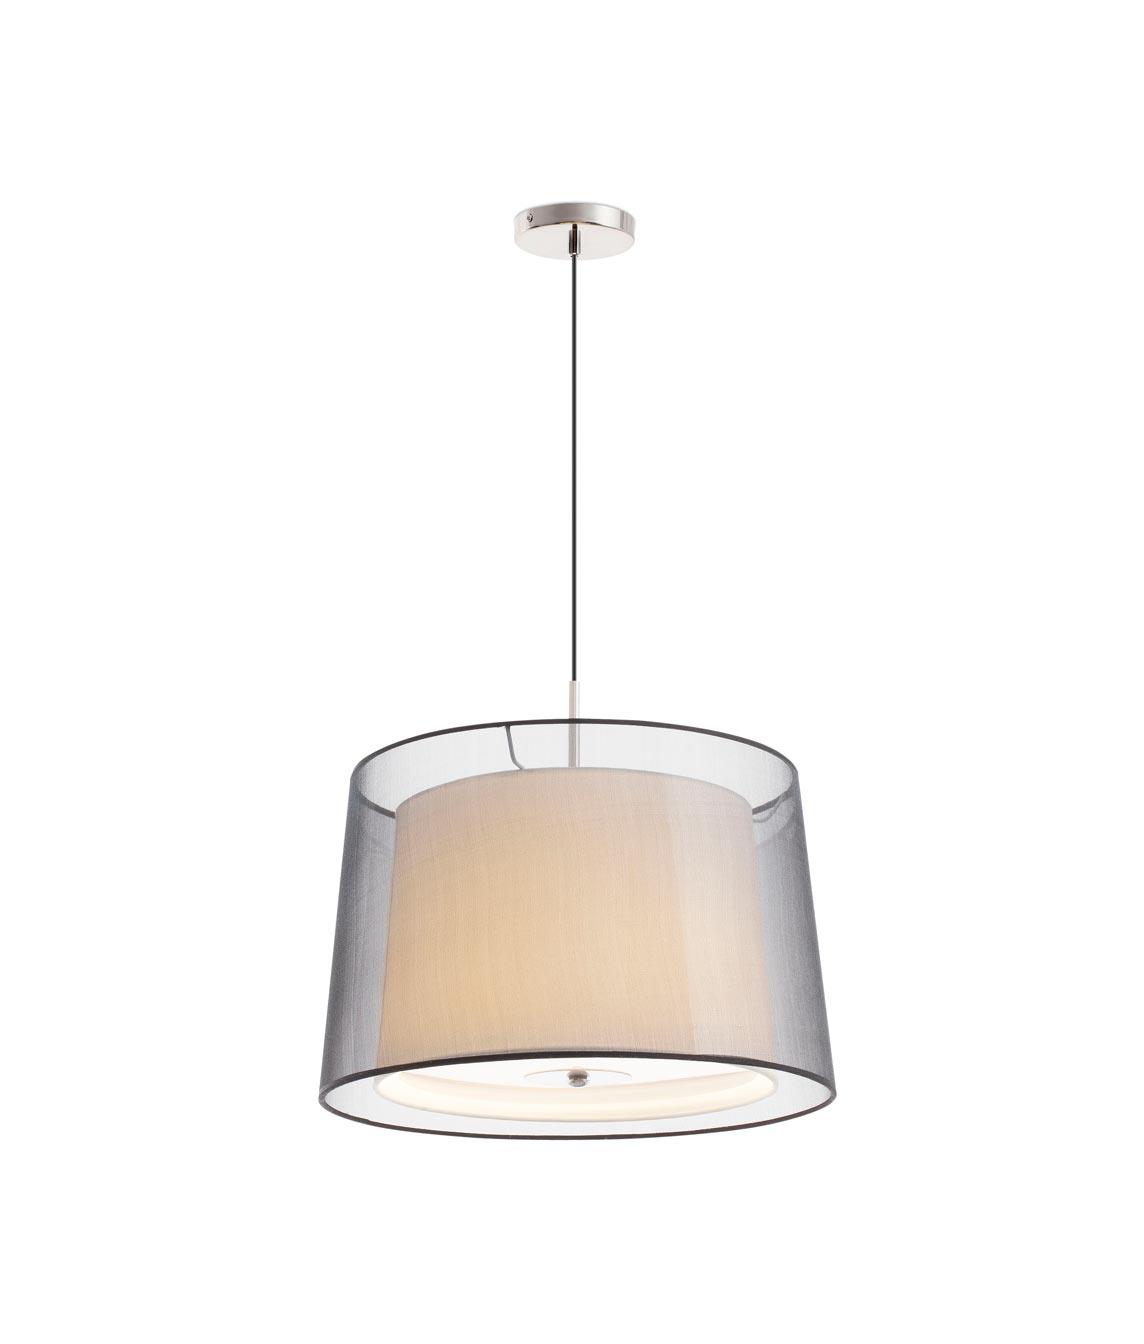 Lámpara colgante 3 luces SABA níquel mate